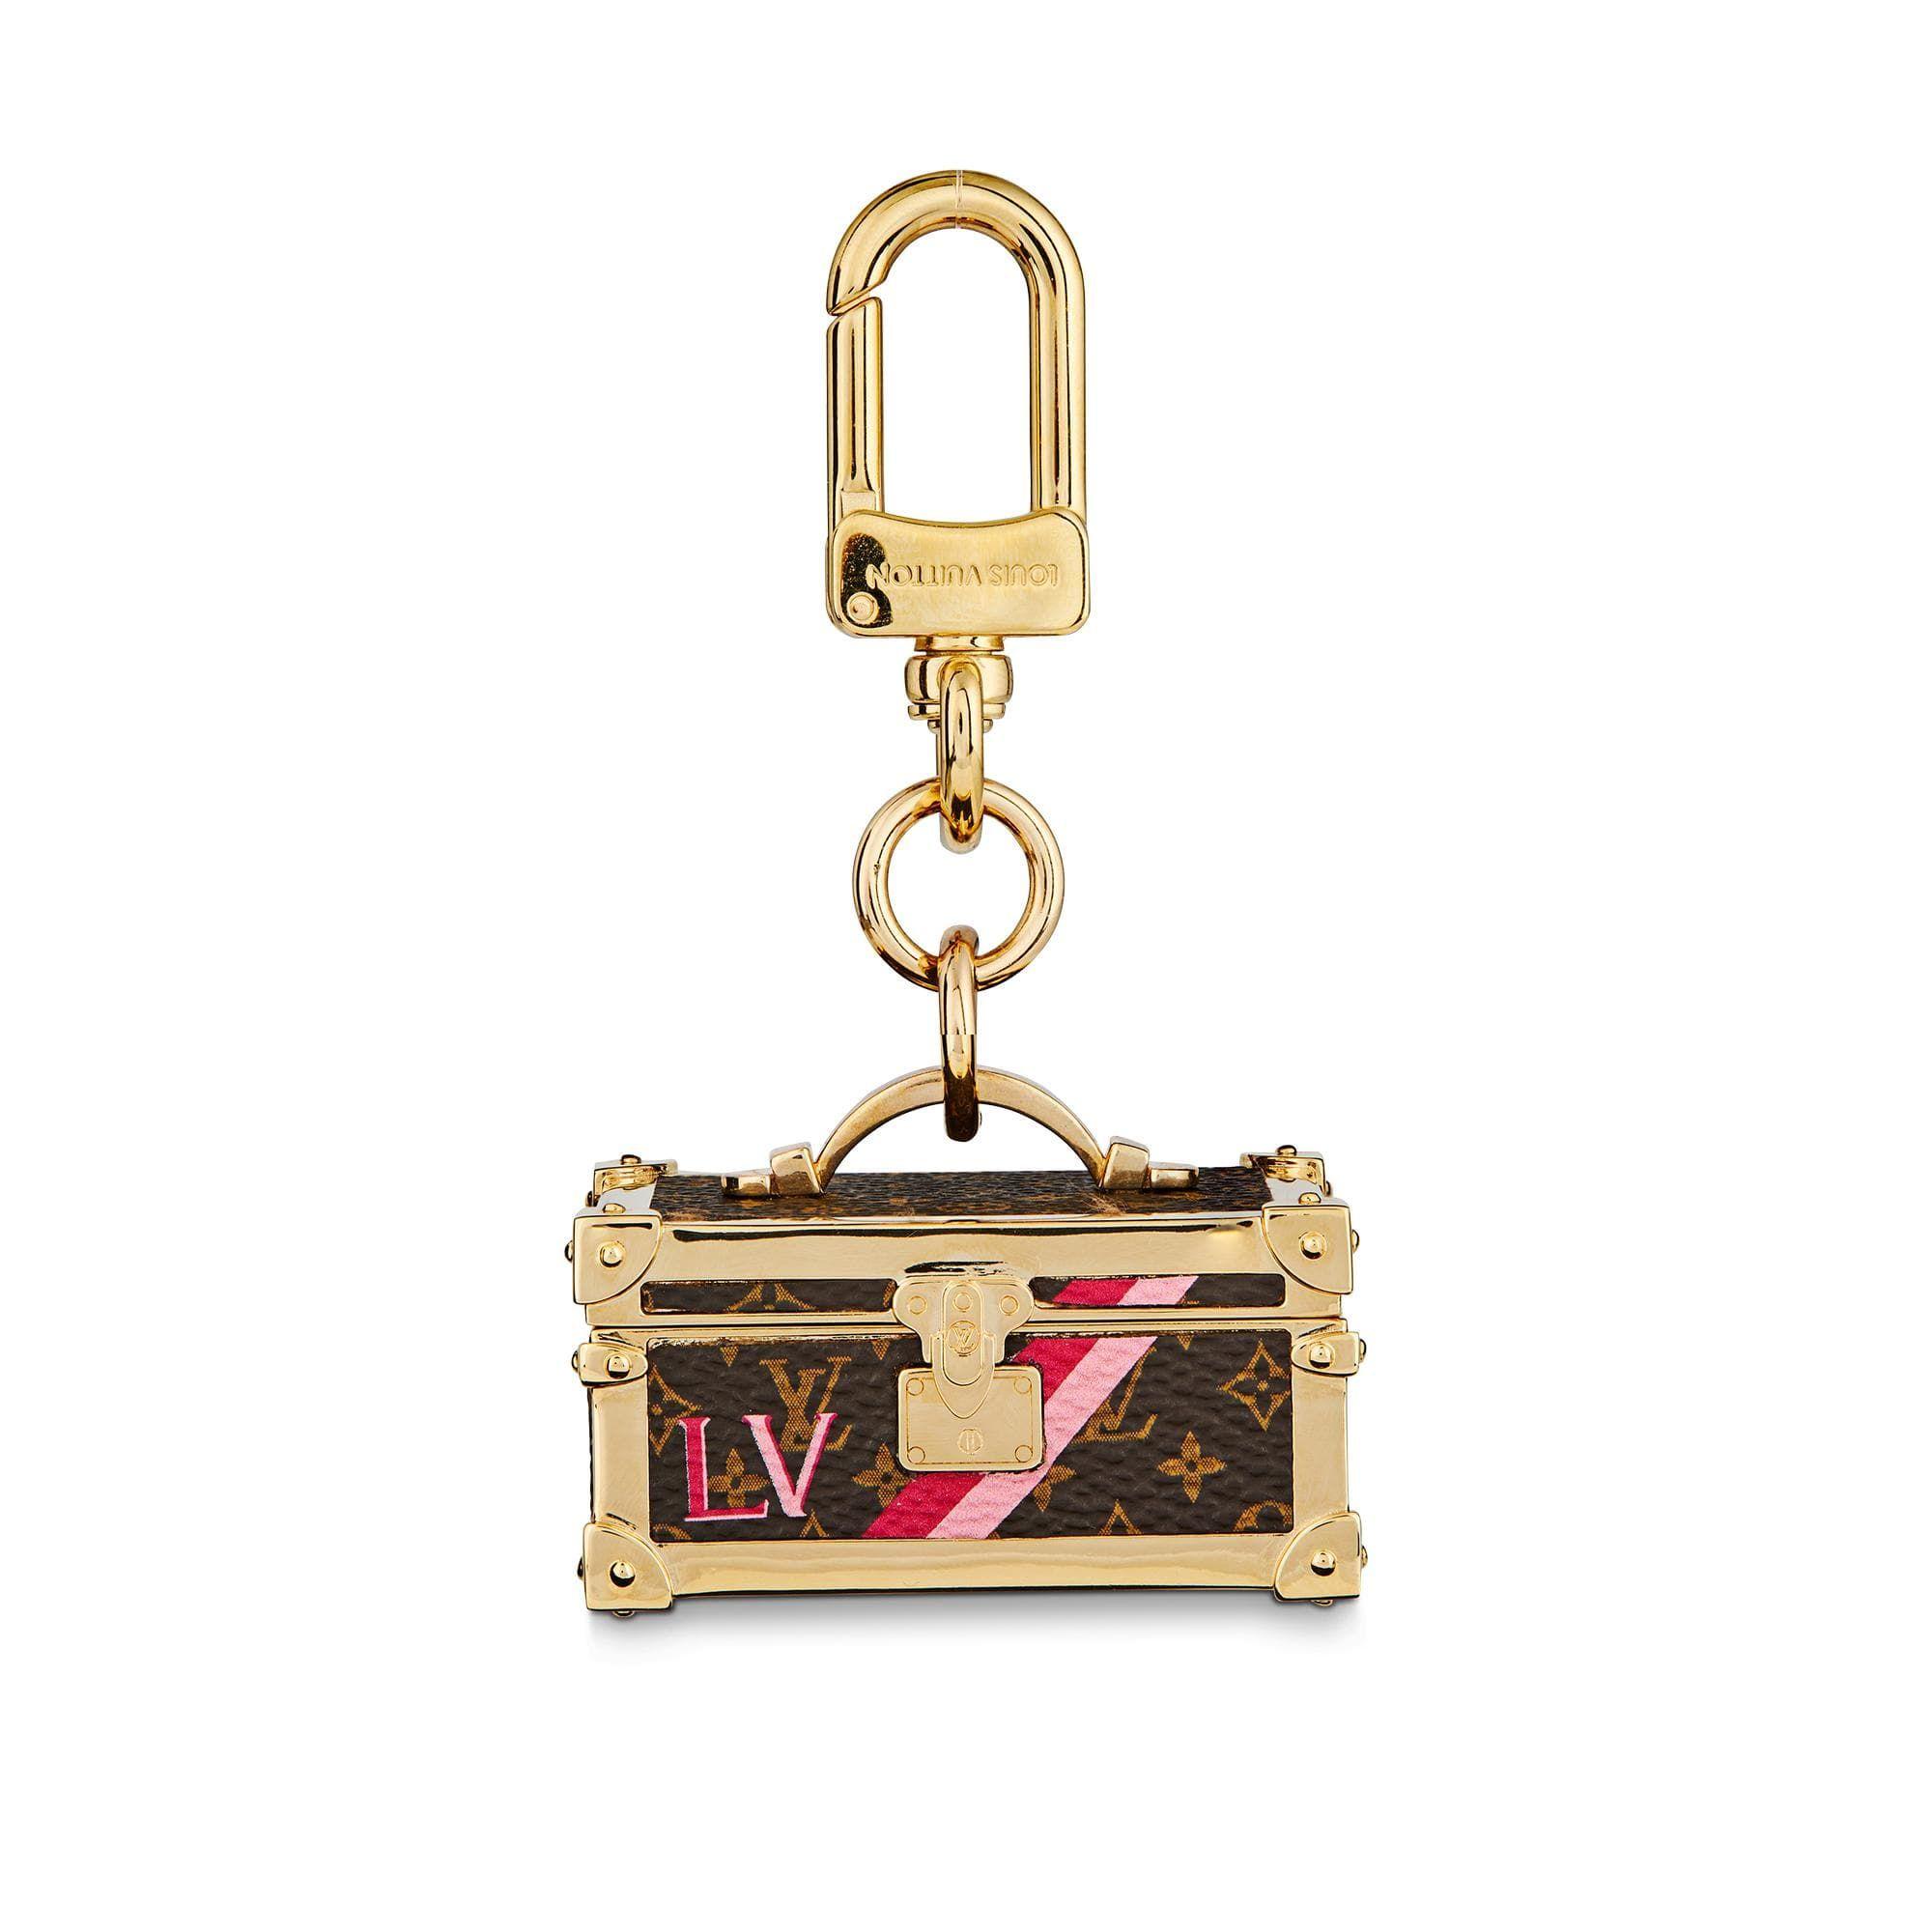 Flower trunk bag charm and key holder via louis vuitton